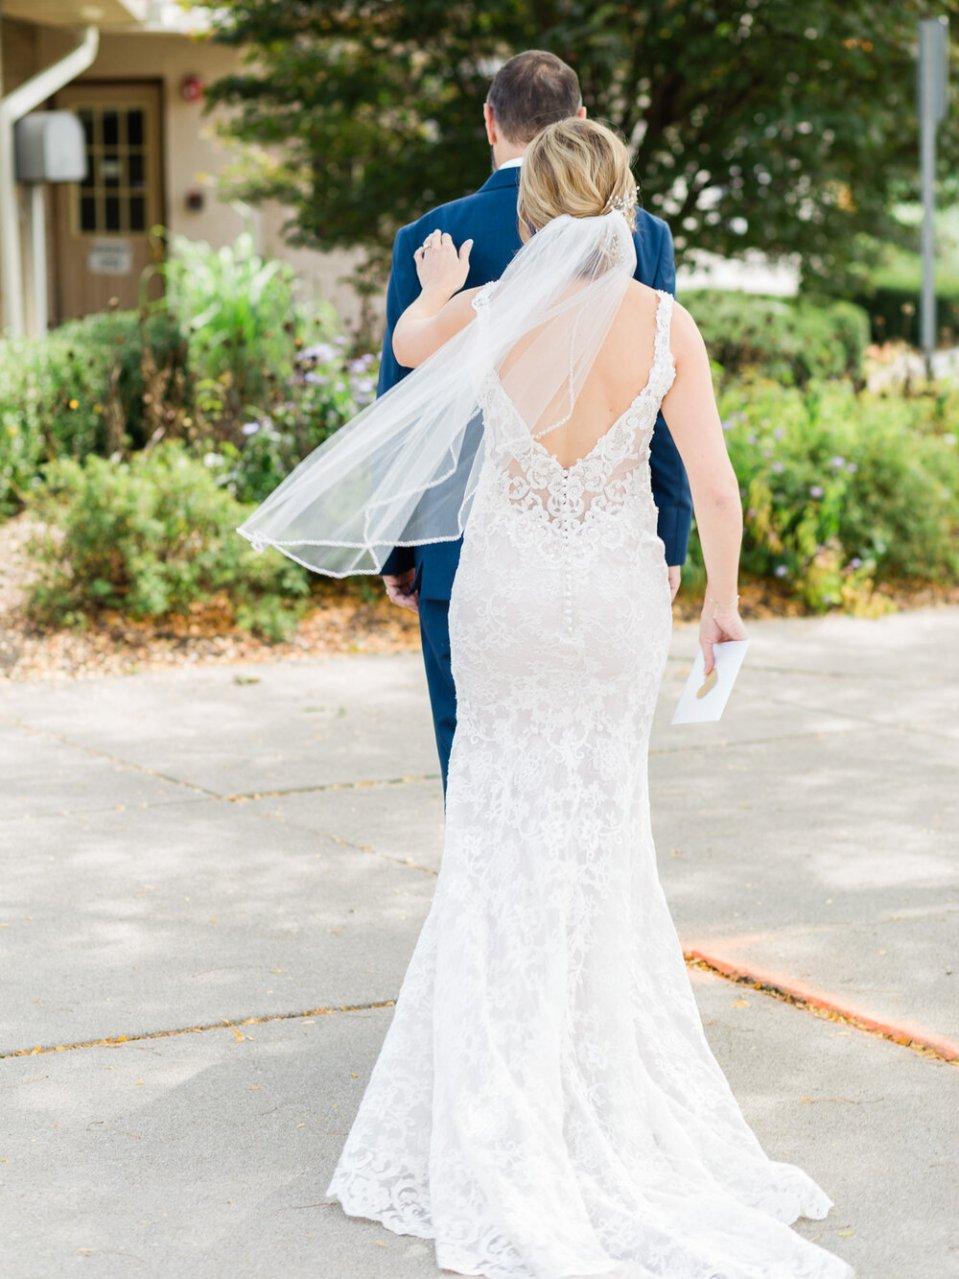 Elegant and Joyful Wedding at Crago Farms in Columbus, Ohio-13.jpg